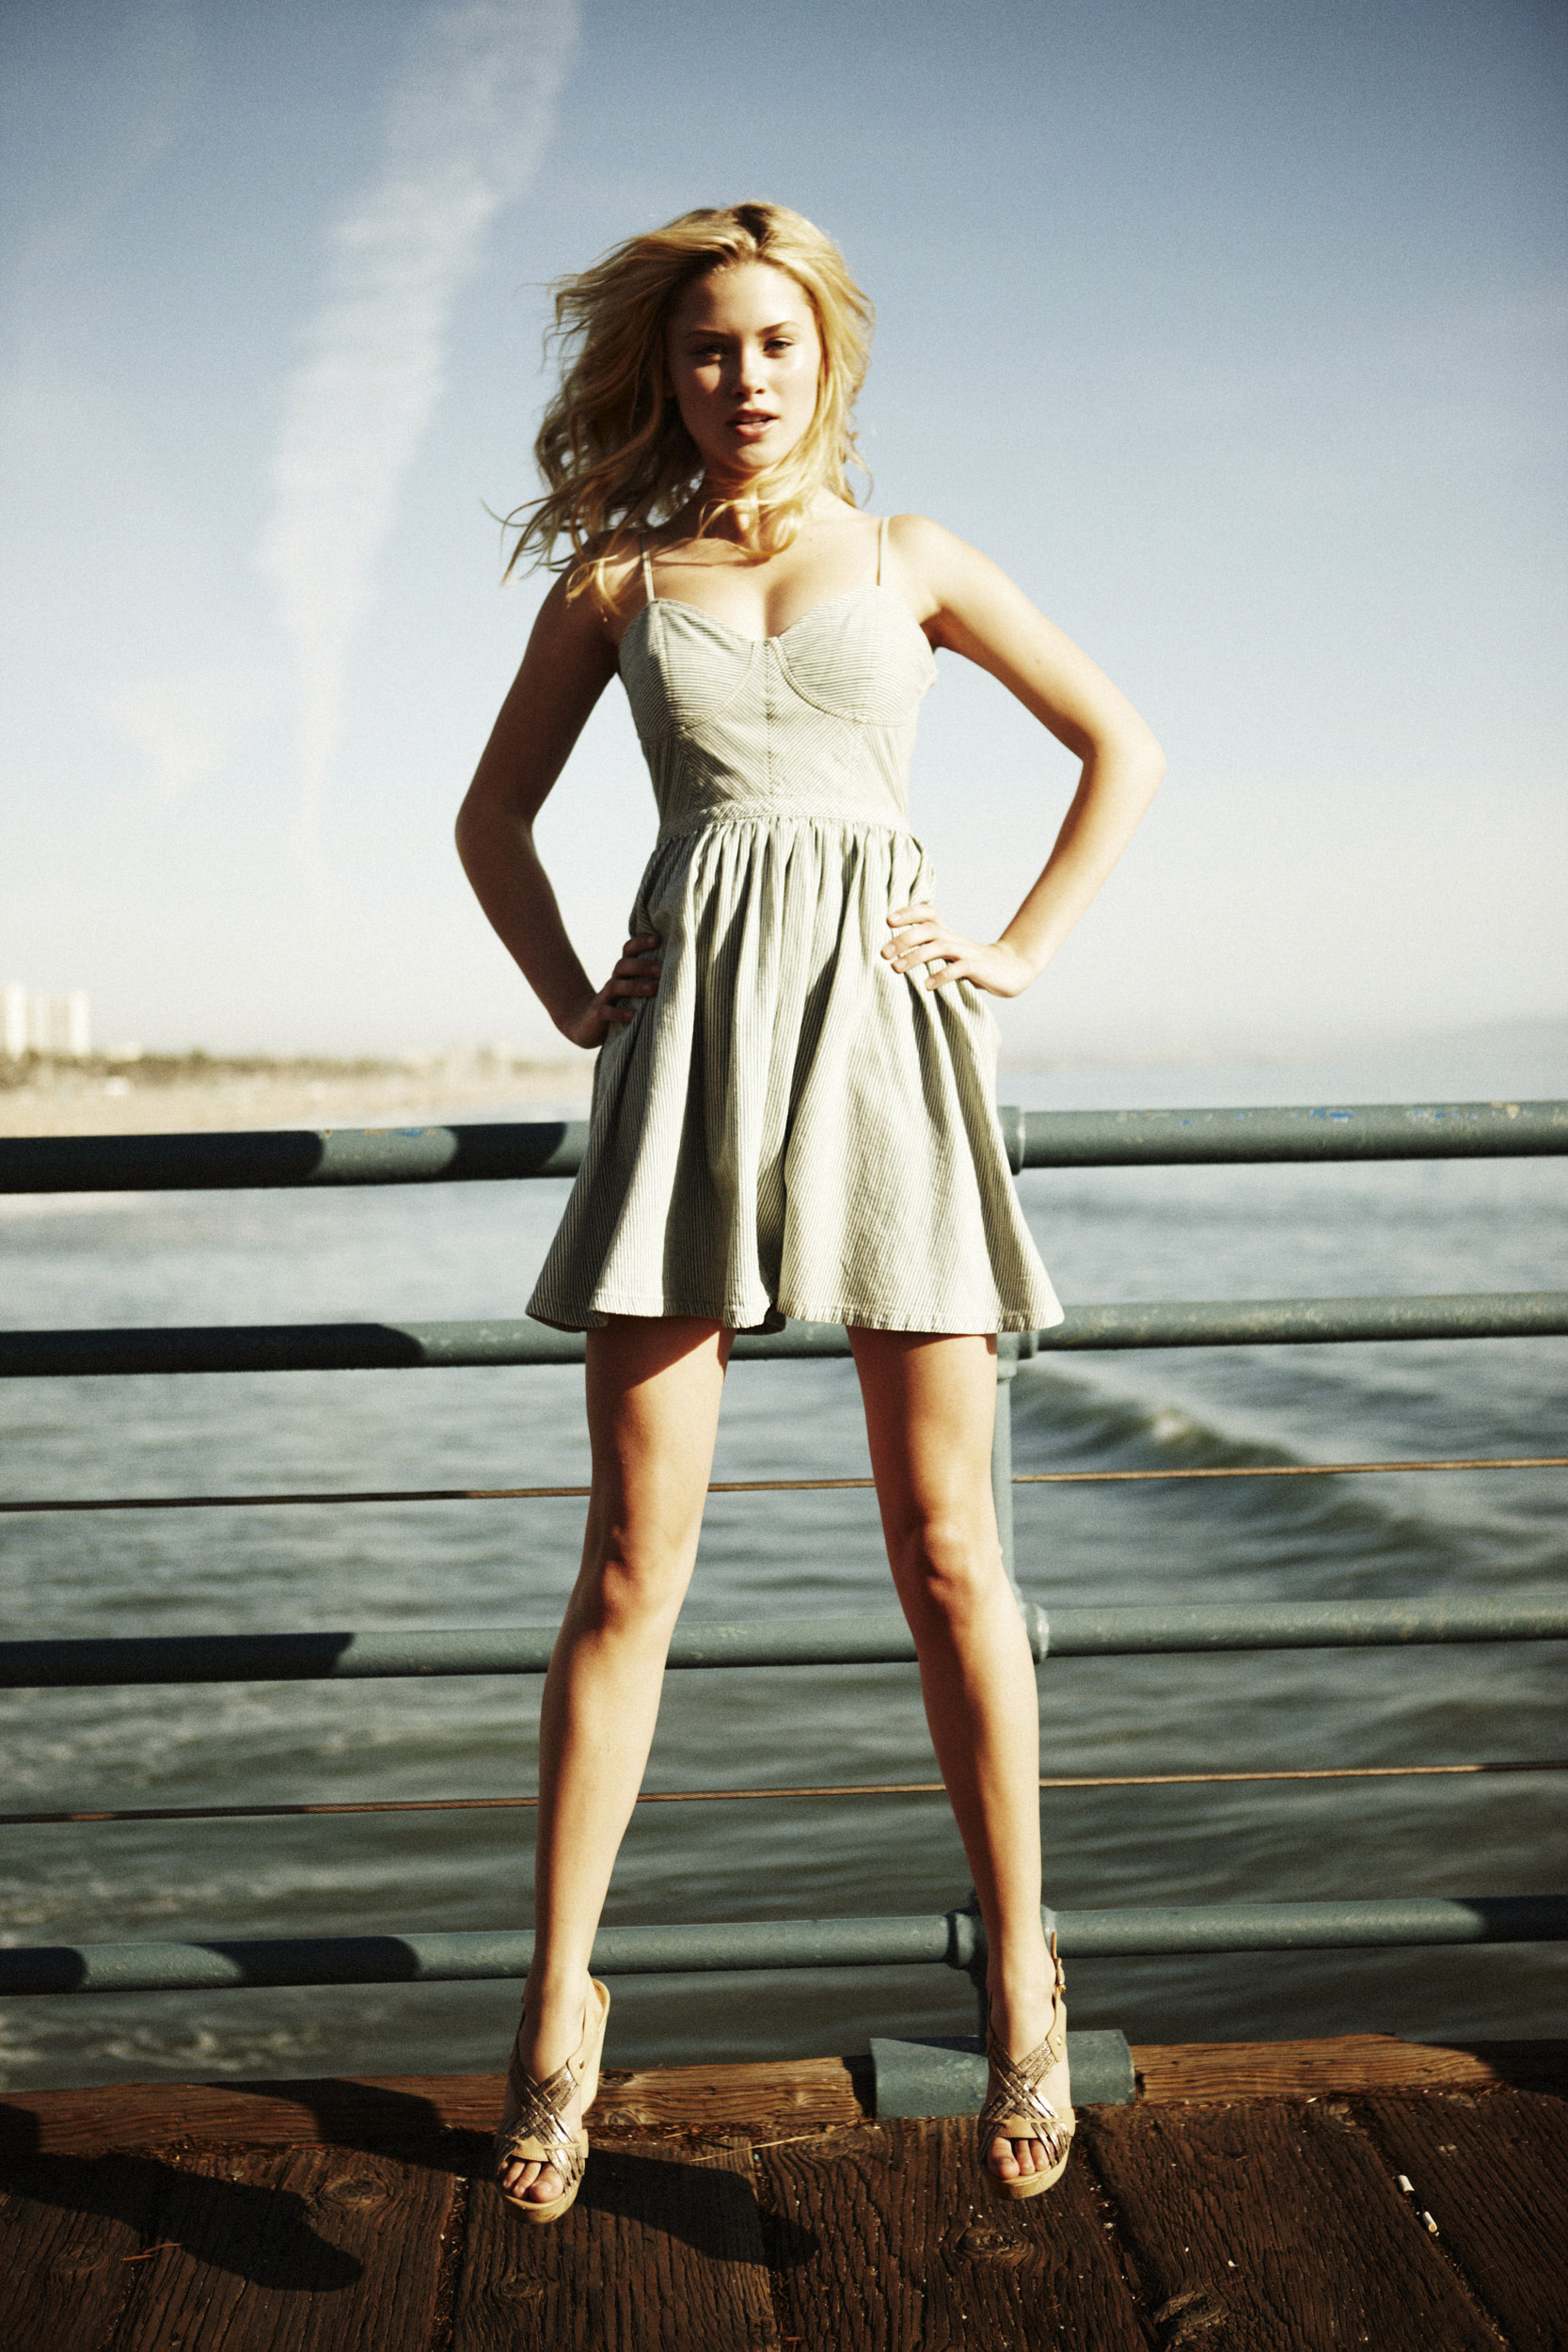 FORD Model Malibu Beach Shoot with Ginny Gardner  Amy Clarke